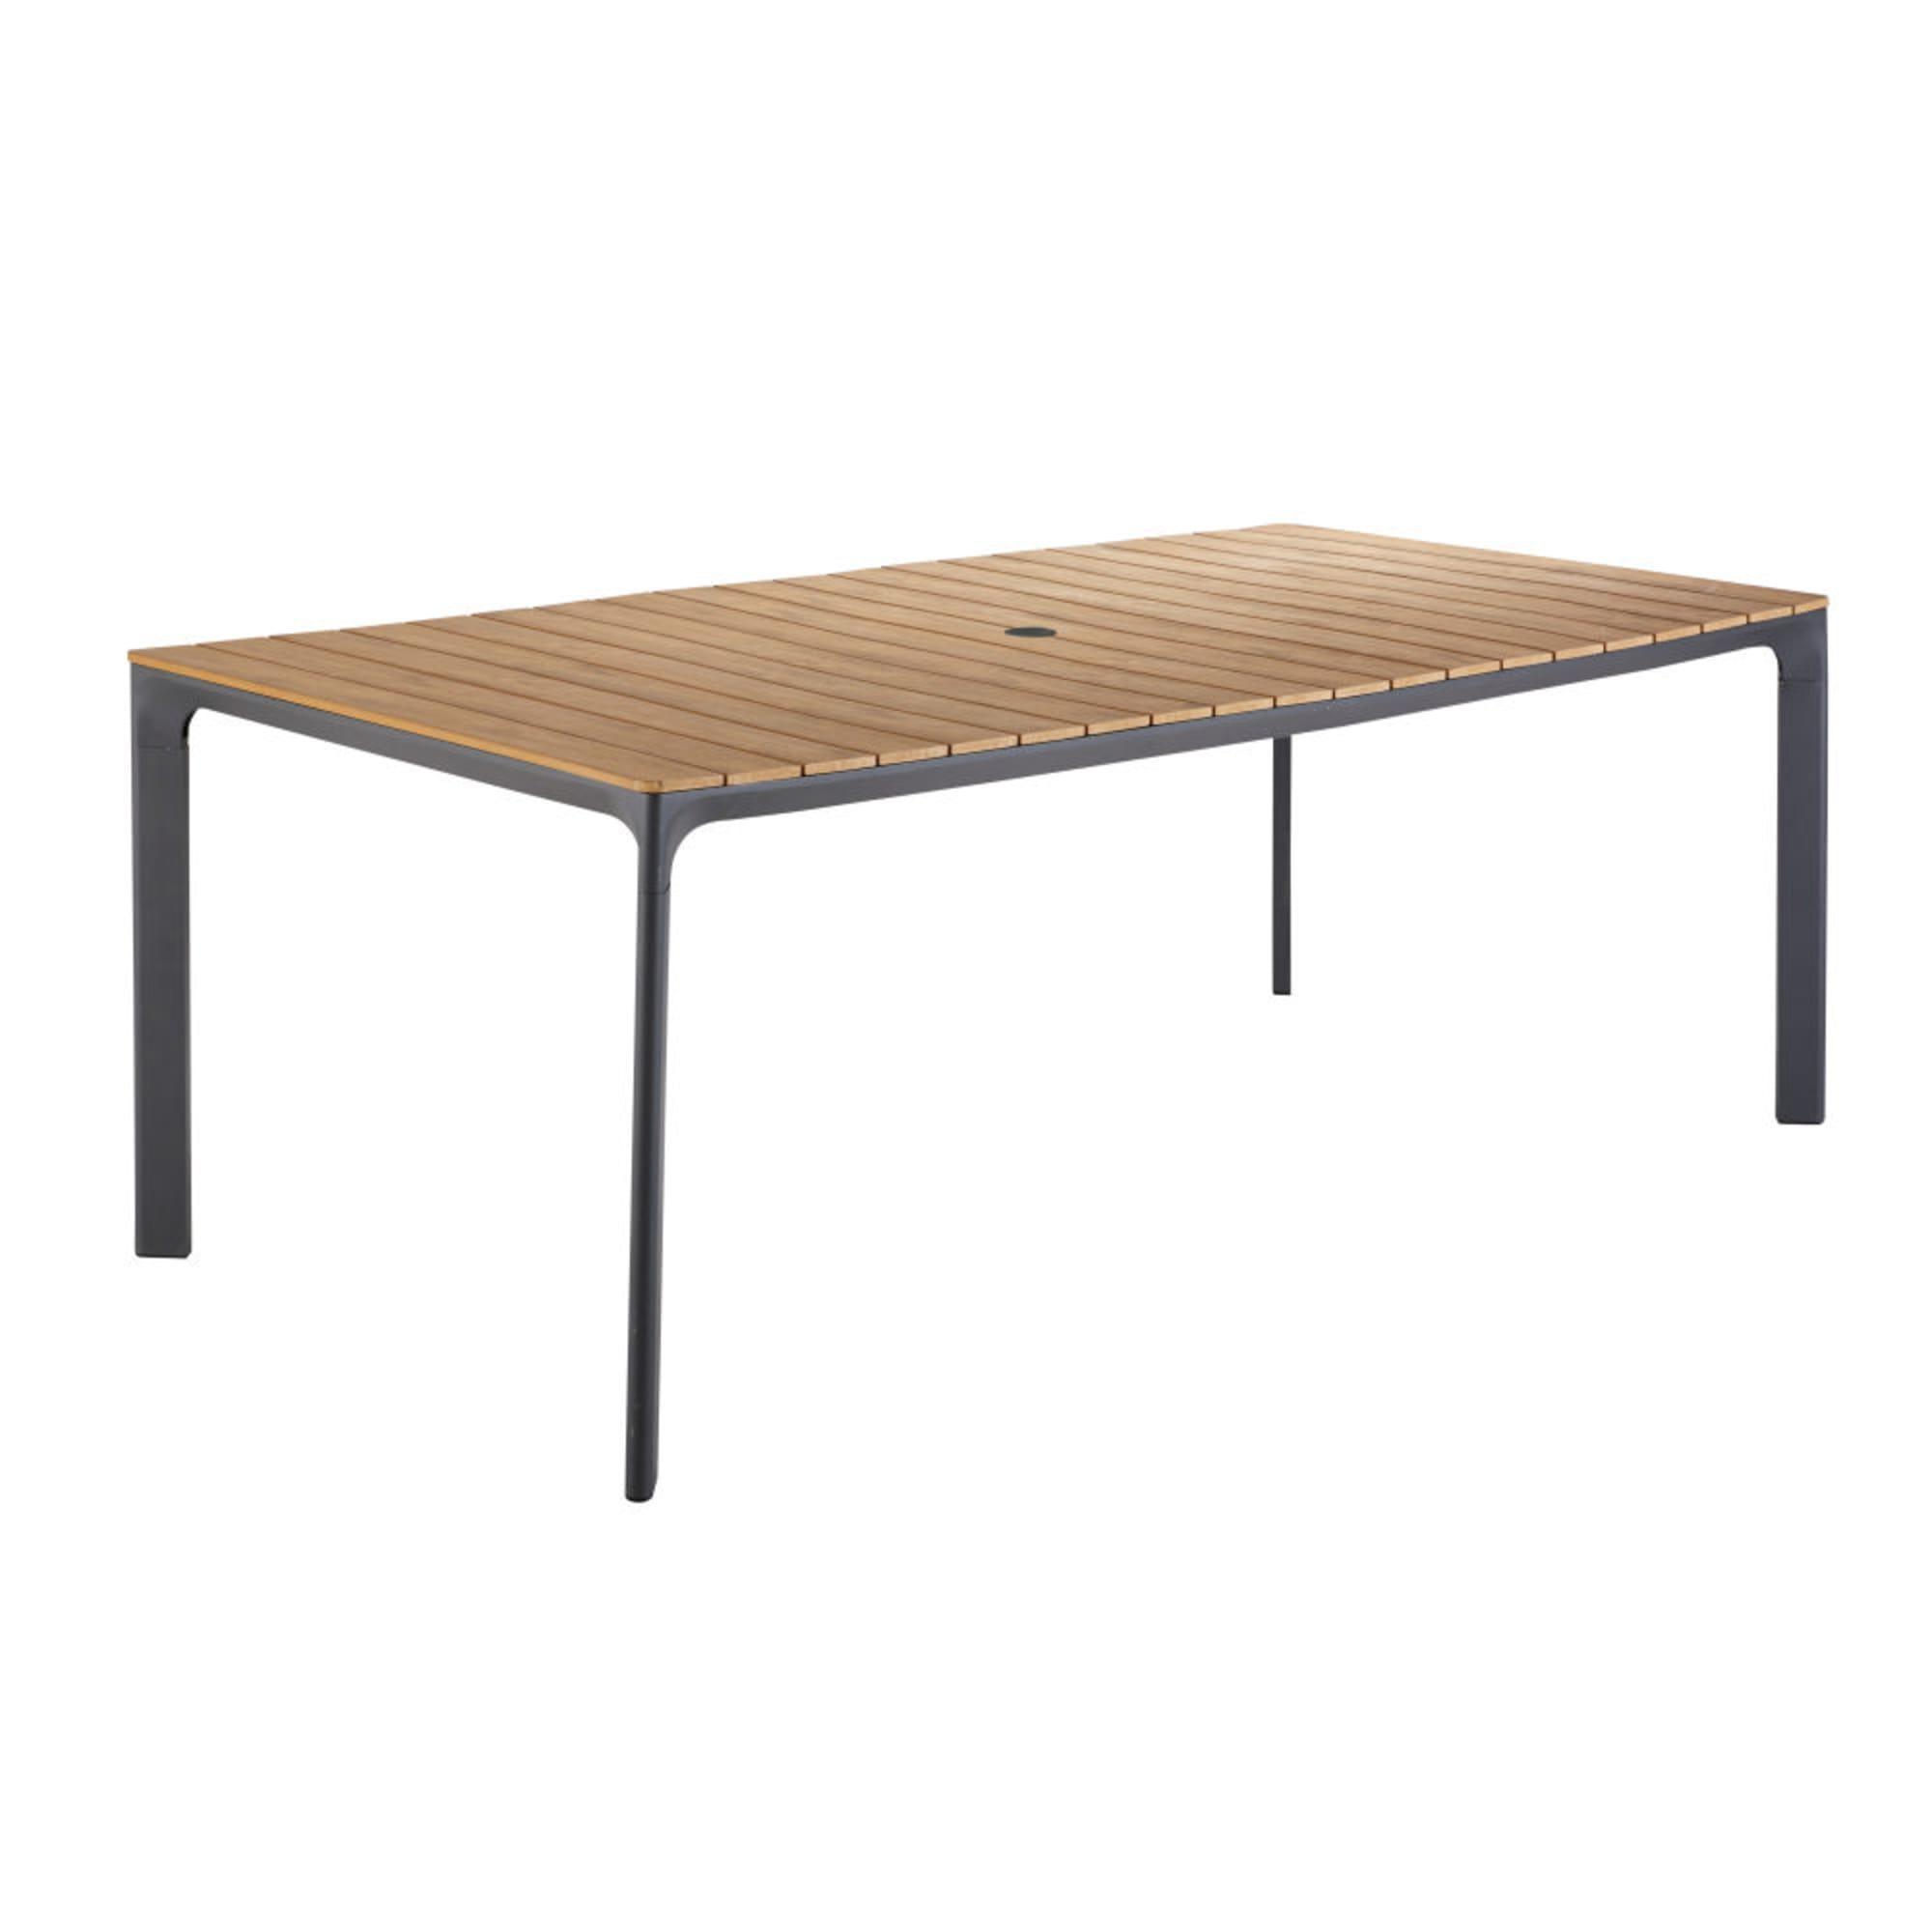 Charcoal Grey Aluminium 6 8 Seater Garden Table L200 Maisons Du Monde Outdoor Dining Table Garden Table Modern Outdoor Dining